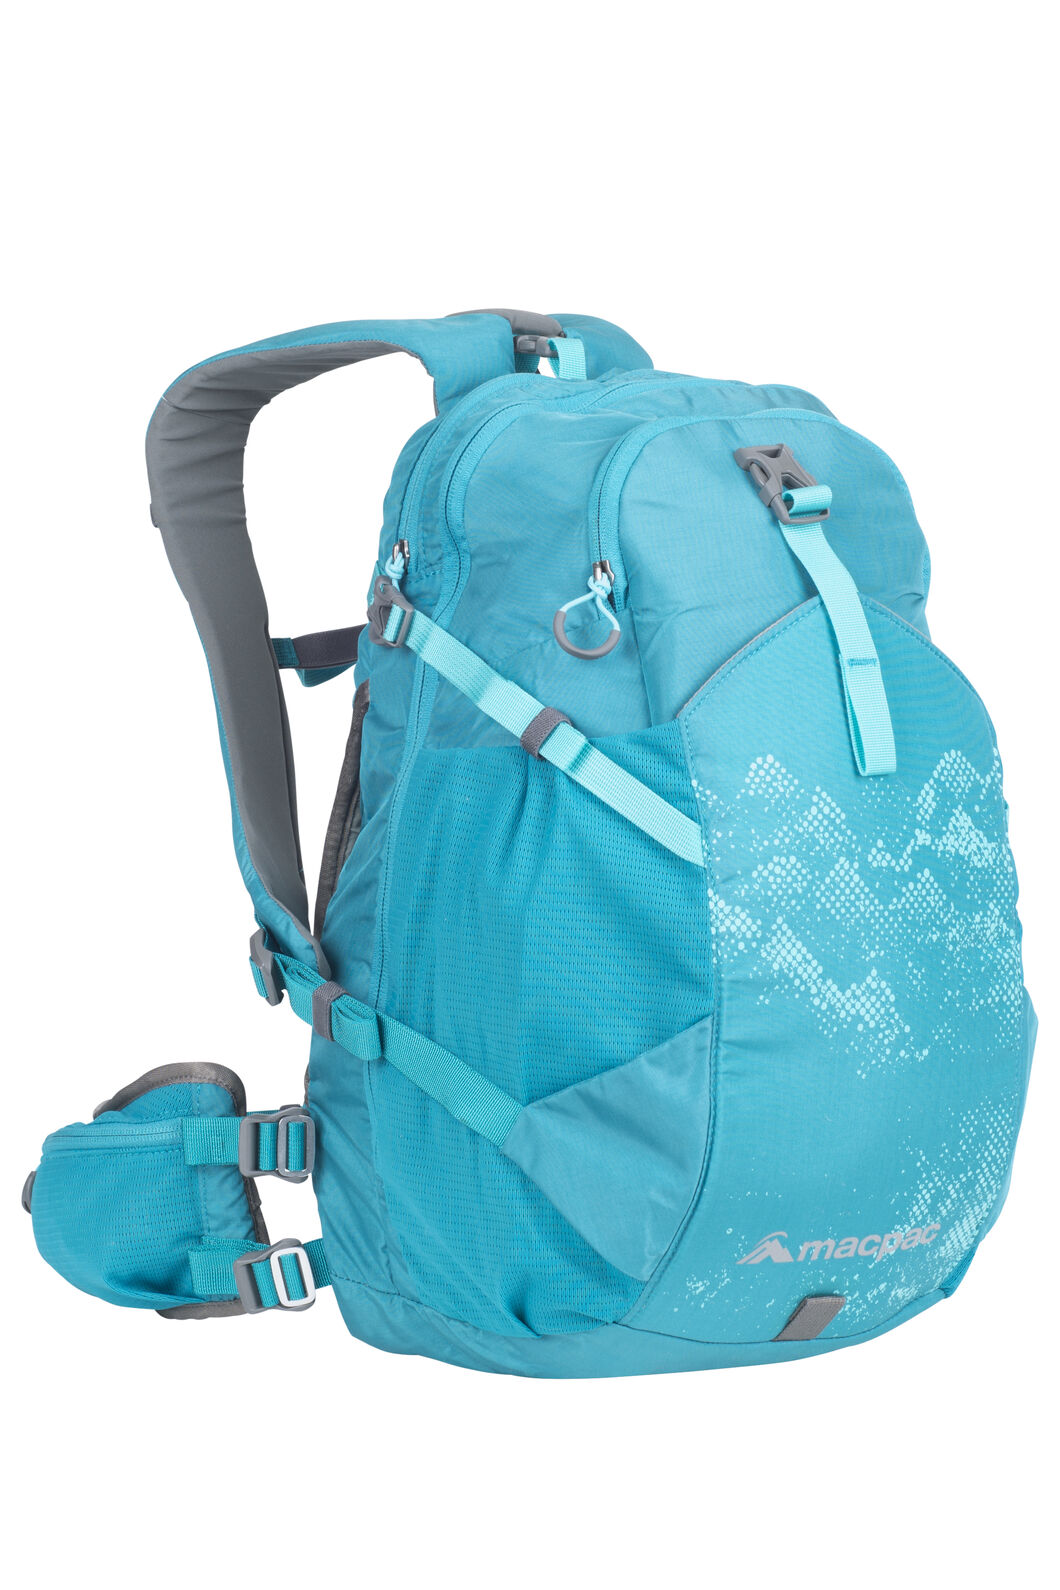 Macpac Mountain Bike 18L Pack, Enamel Blue, hi-res